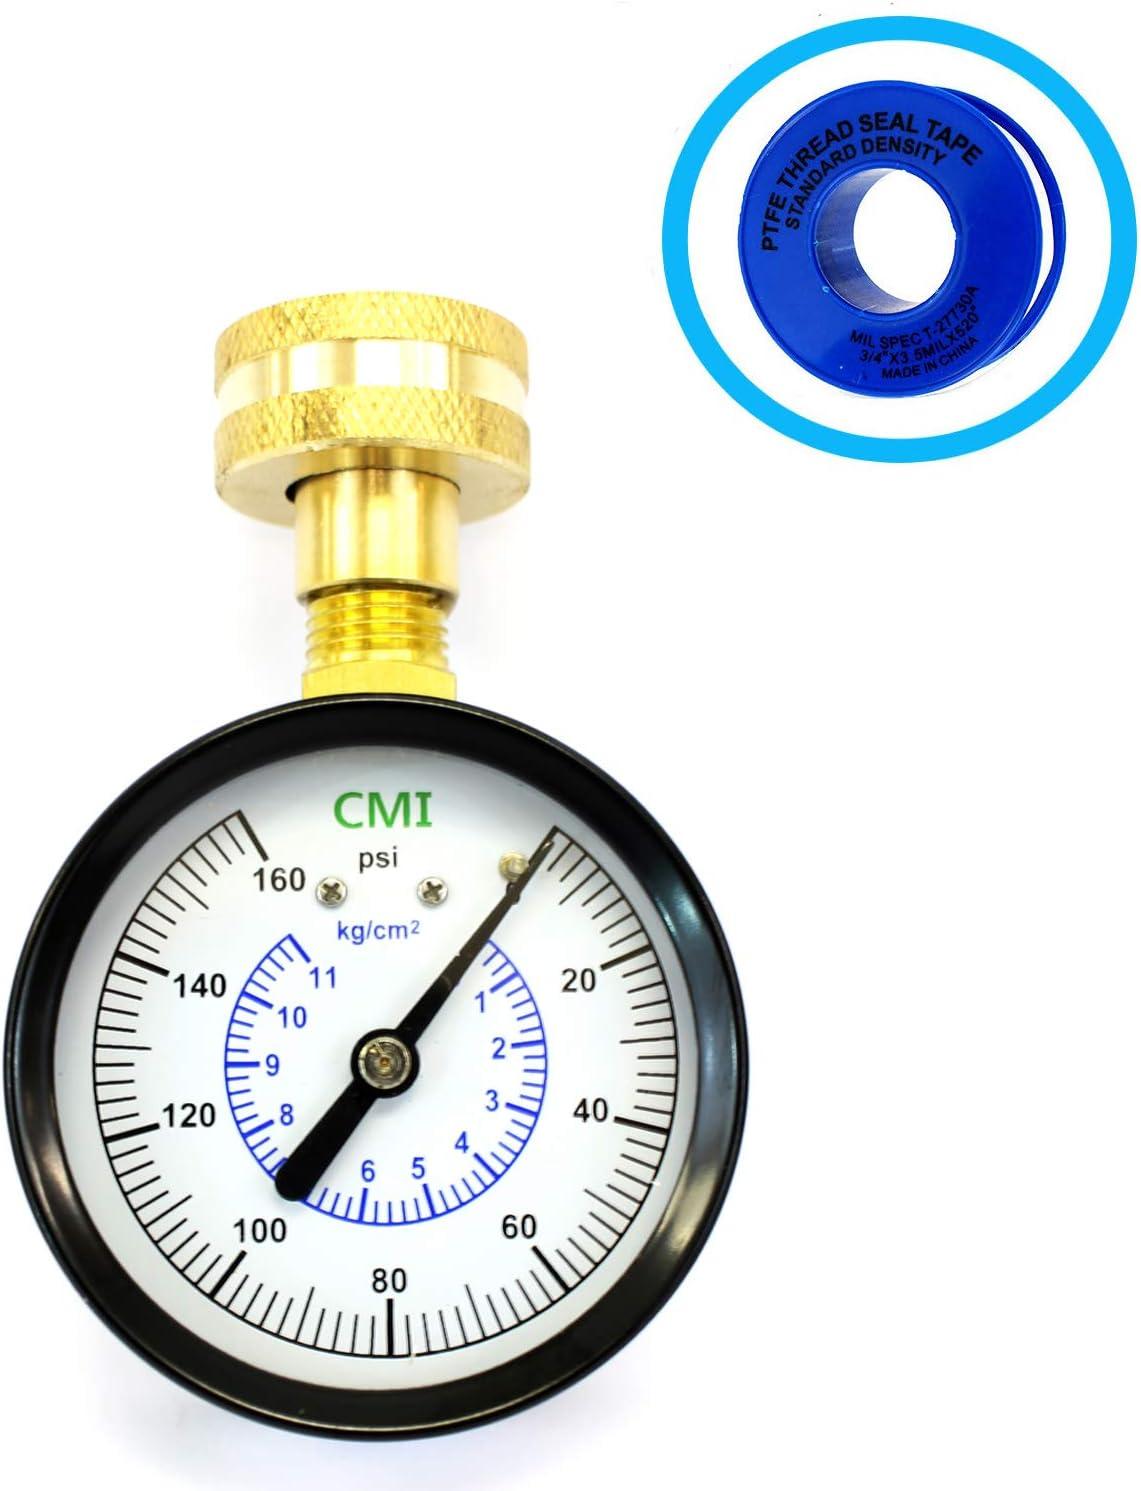 "Charman Manufacturing Water Pressure Test Gauge, 3/4"" Female Hose Thread,0-160 PSI,for Home,Hose Bib, Garden Hose, Water Pressure Tester Meter (160 PSI)"